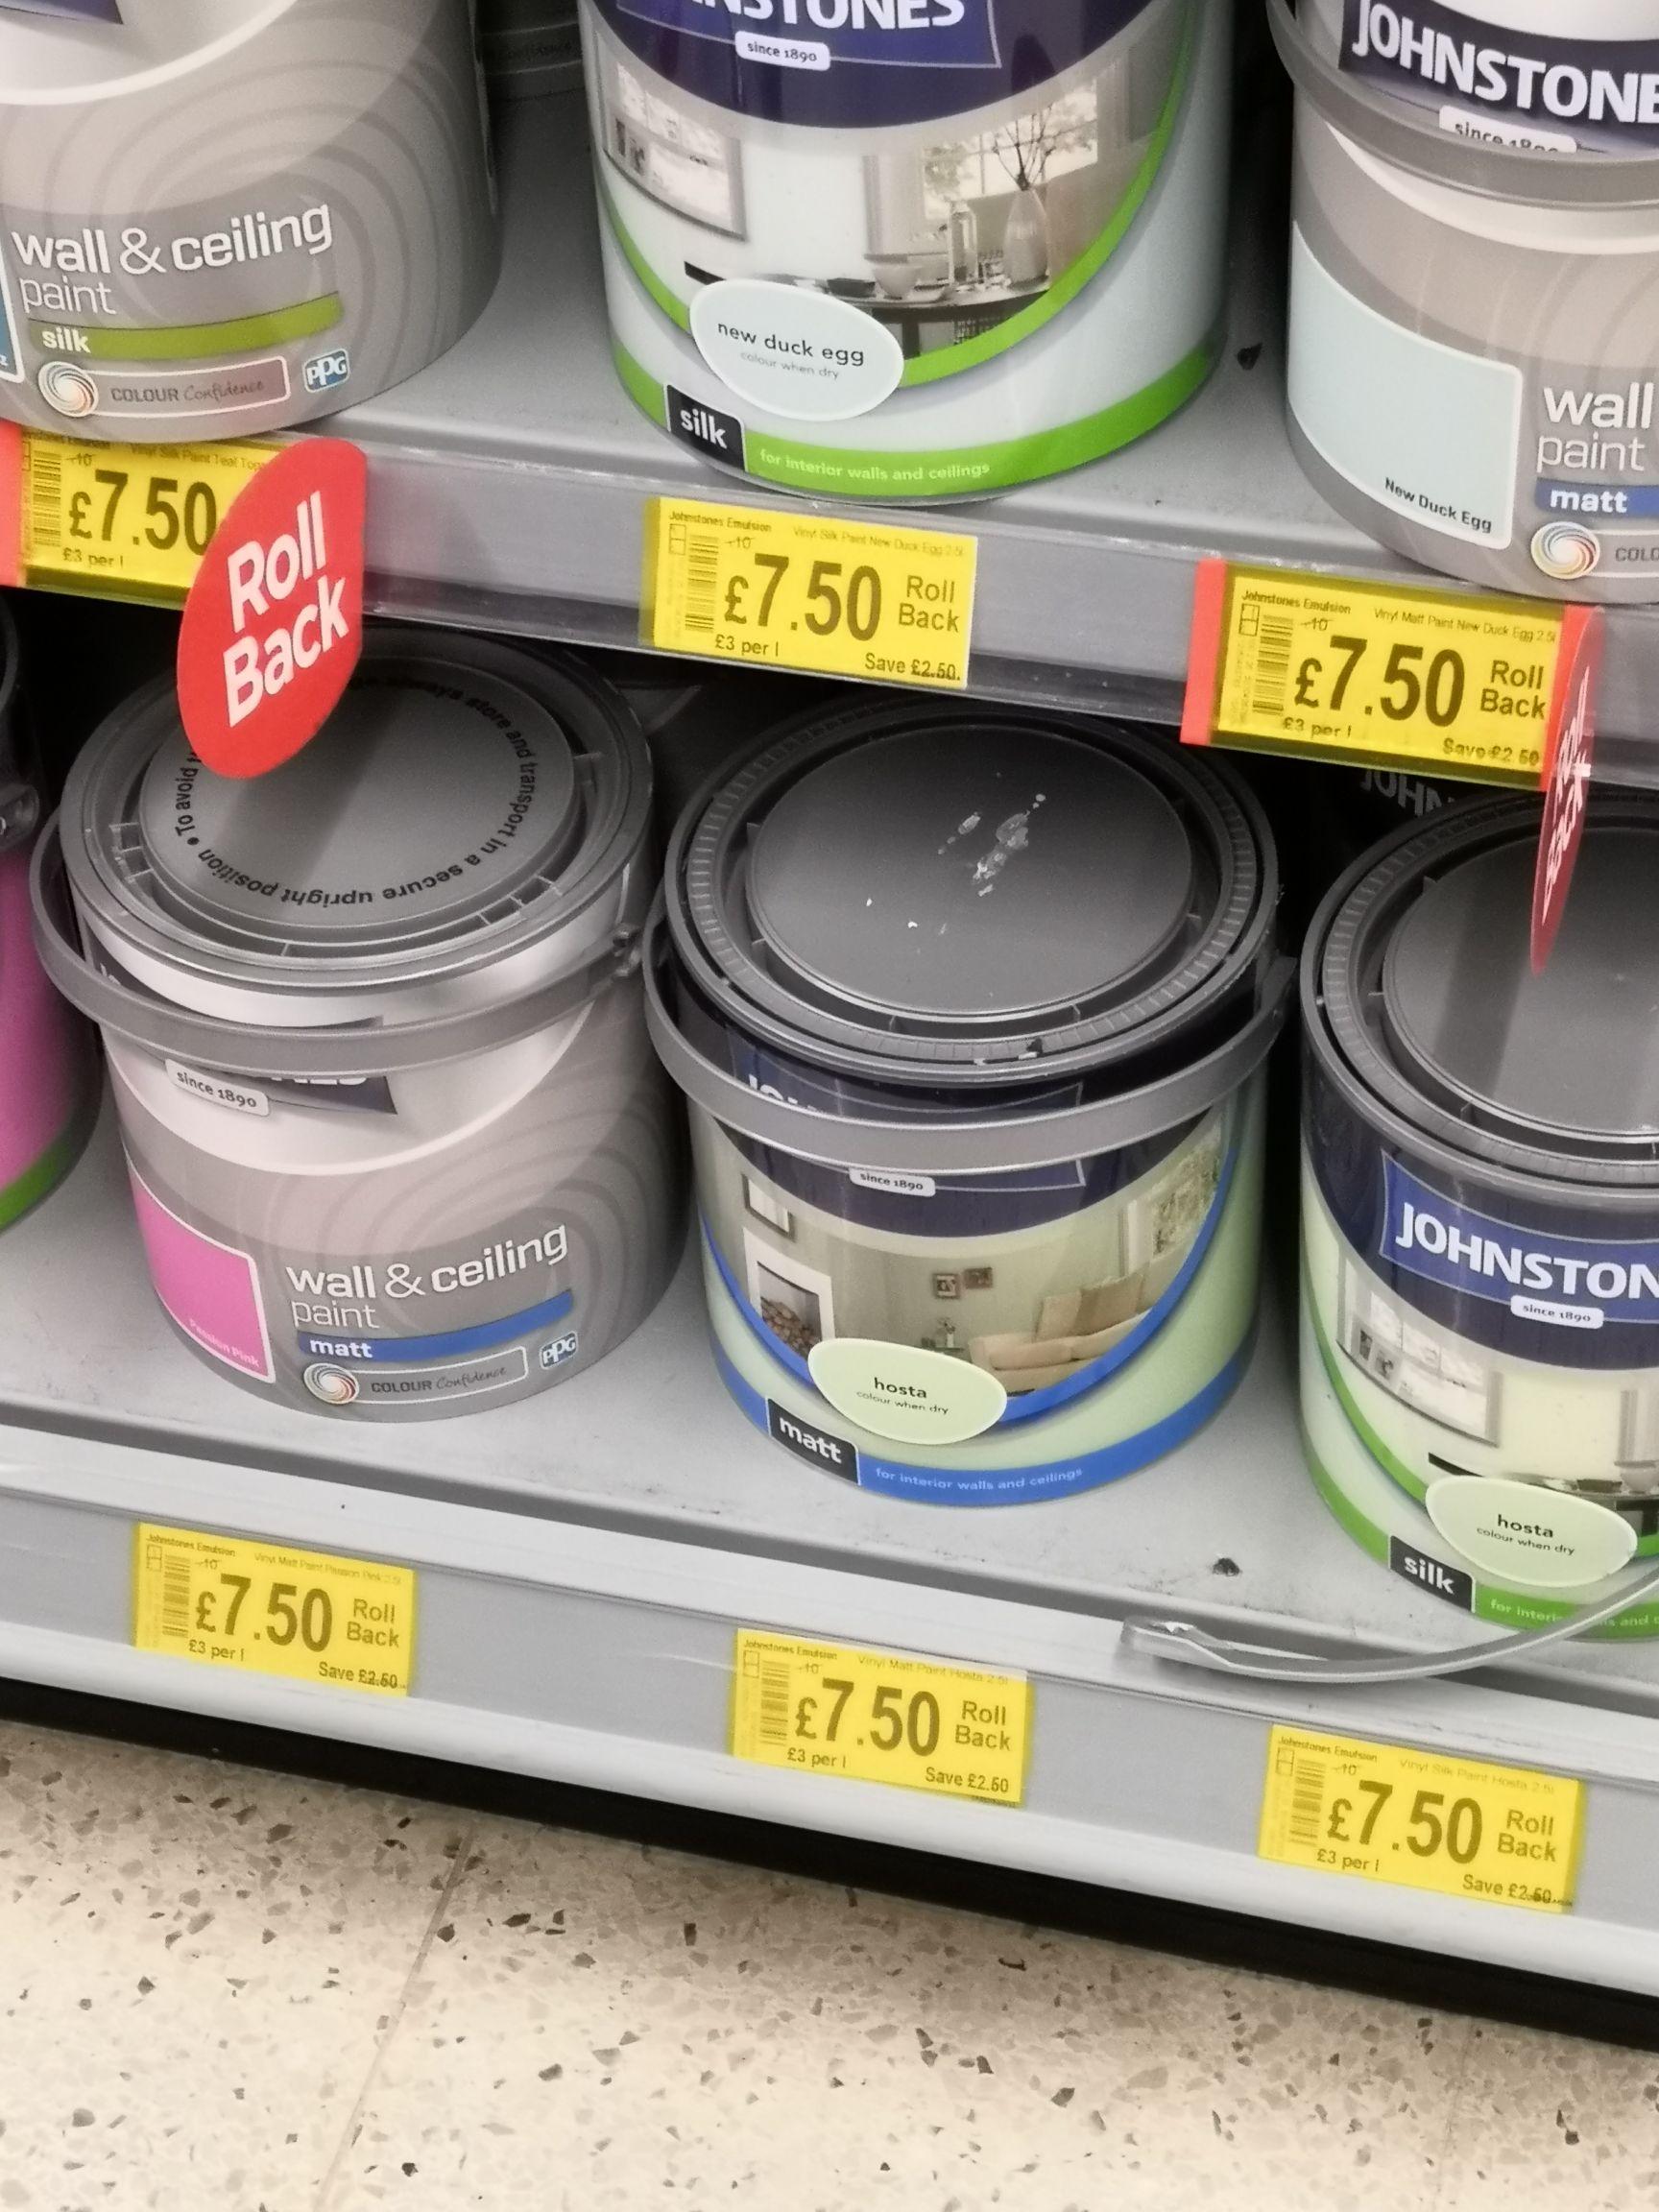 Asda Johnstone's 2.5l emulsion paint various £7.50 rollback instore @ asda